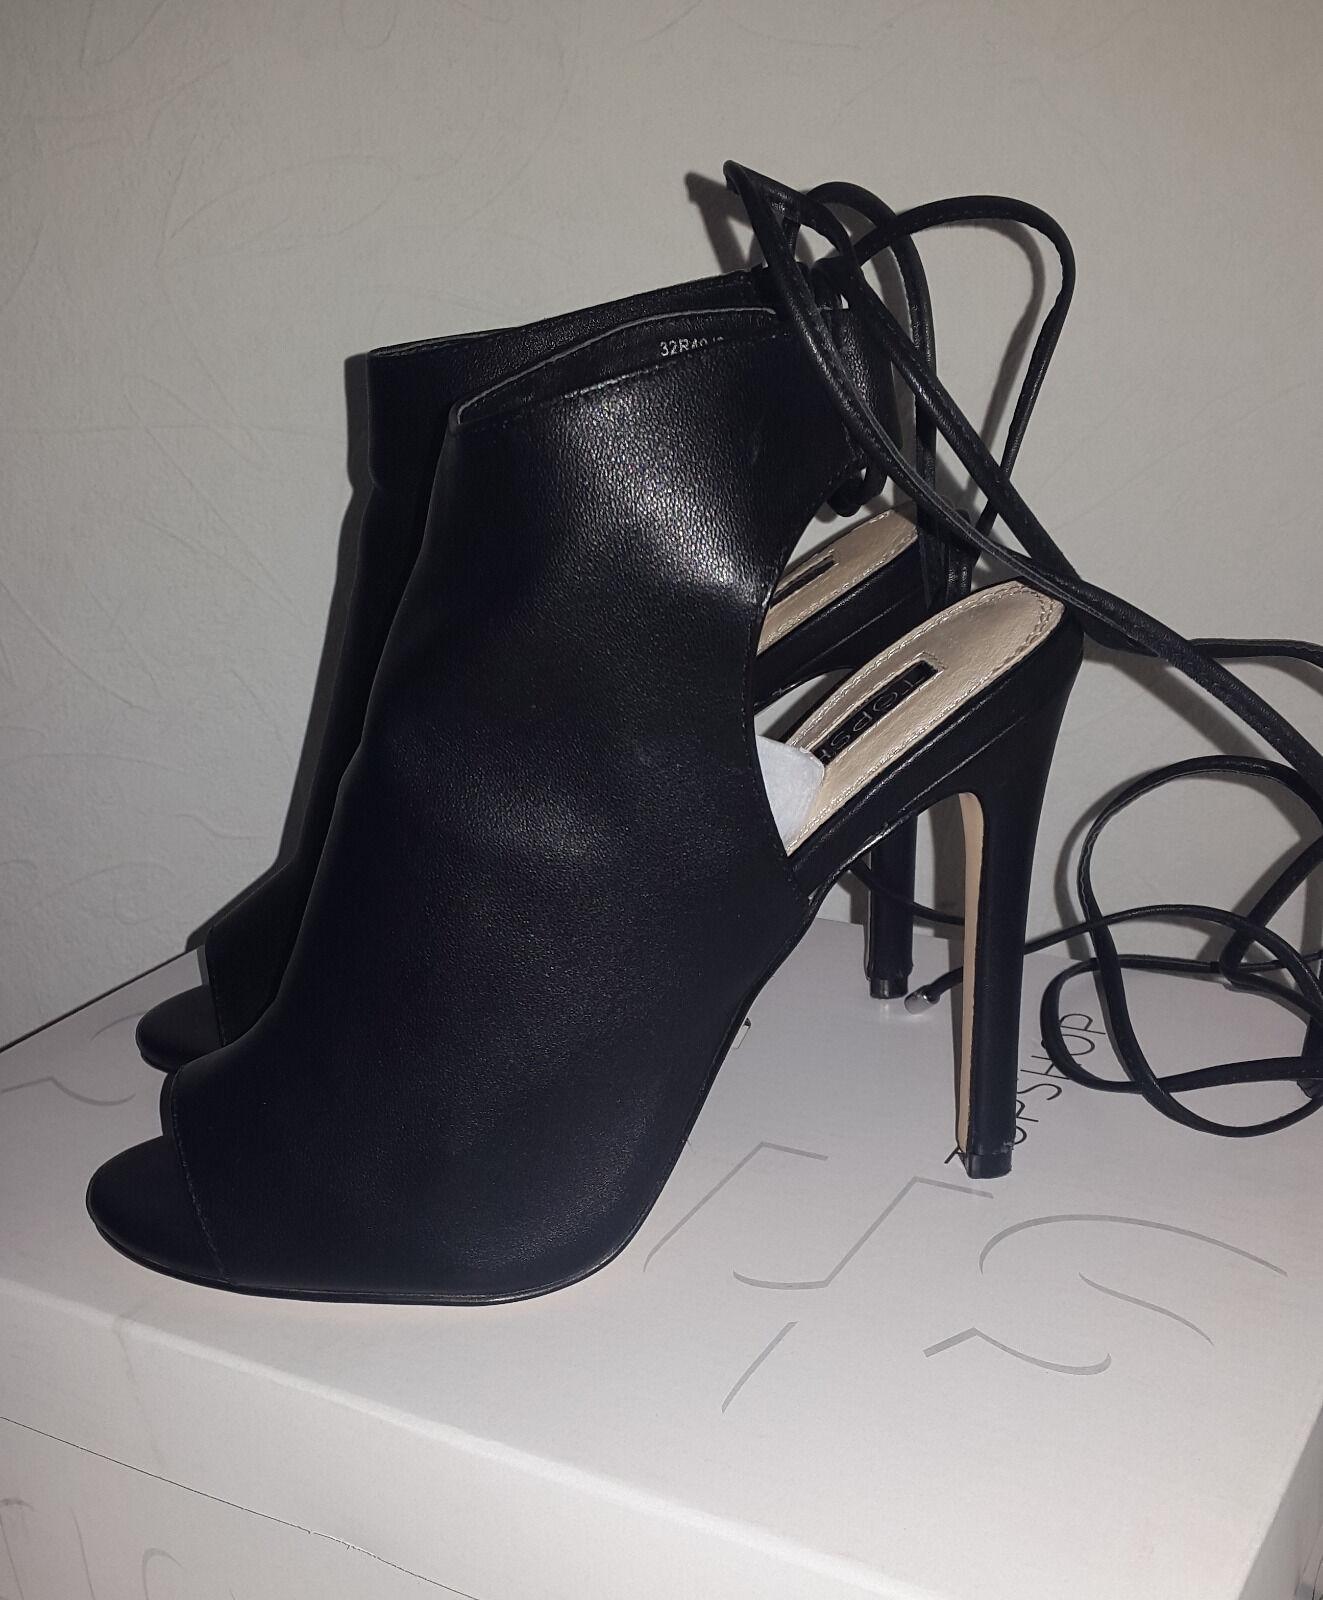 Topshop ROBYN - High Heel Sandaletten - black Damenschuhe Schnürung Leder Gr. 37